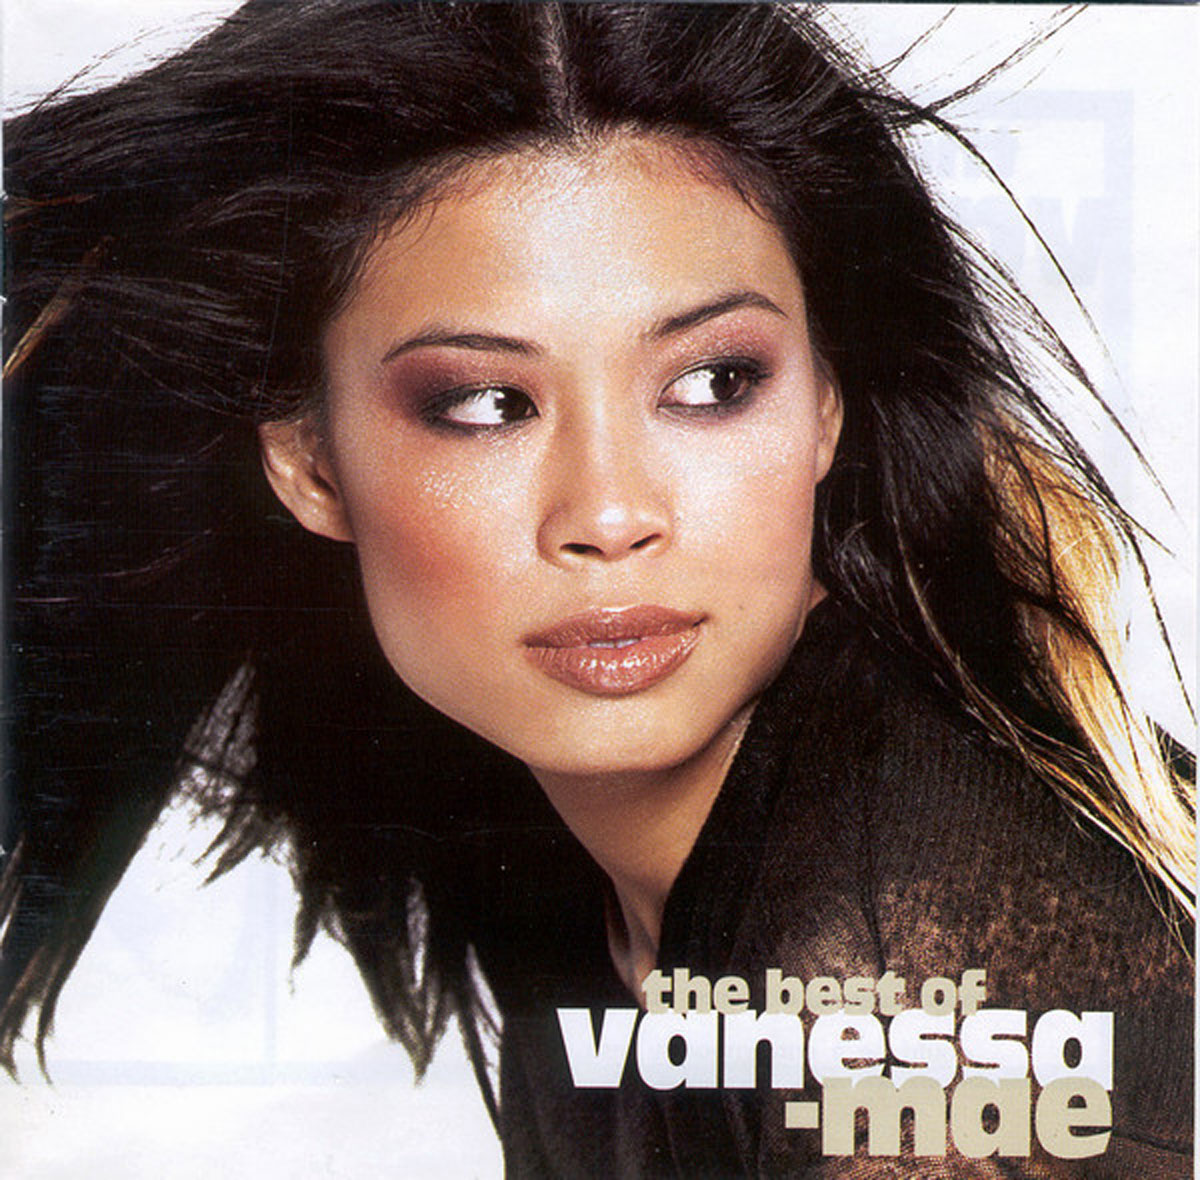 Ванесса Мэй Vanessa Mae. The Best Of (LP) ванесса паради vanessa paradis love songs 2 cd